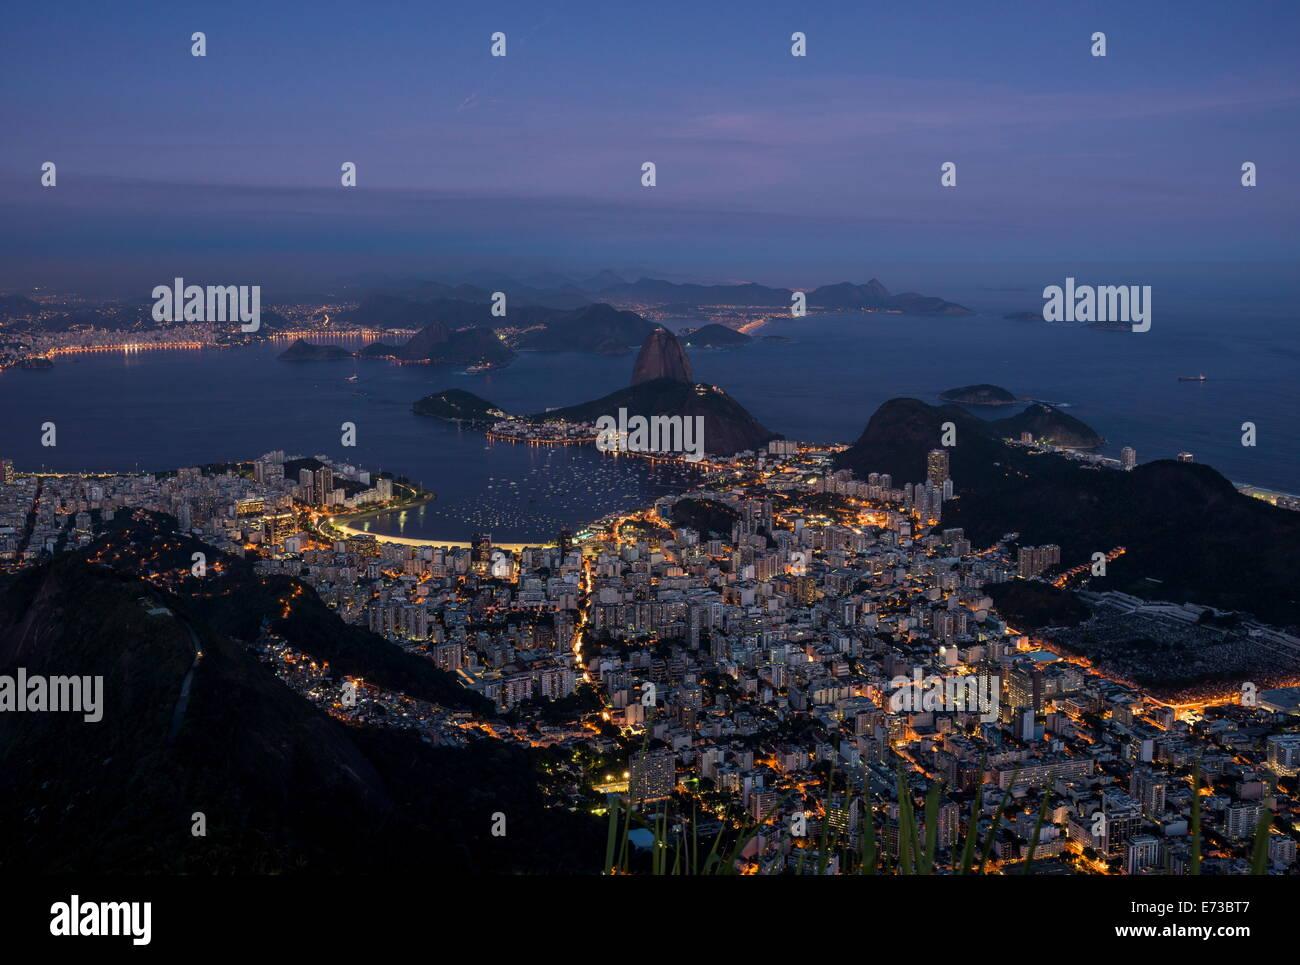 Vue du Cristo Redentor sur Rio de Janeiro, Corcovado la nuit, Rio de Janeiro, Brésil, Amérique du Sud Photo Stock